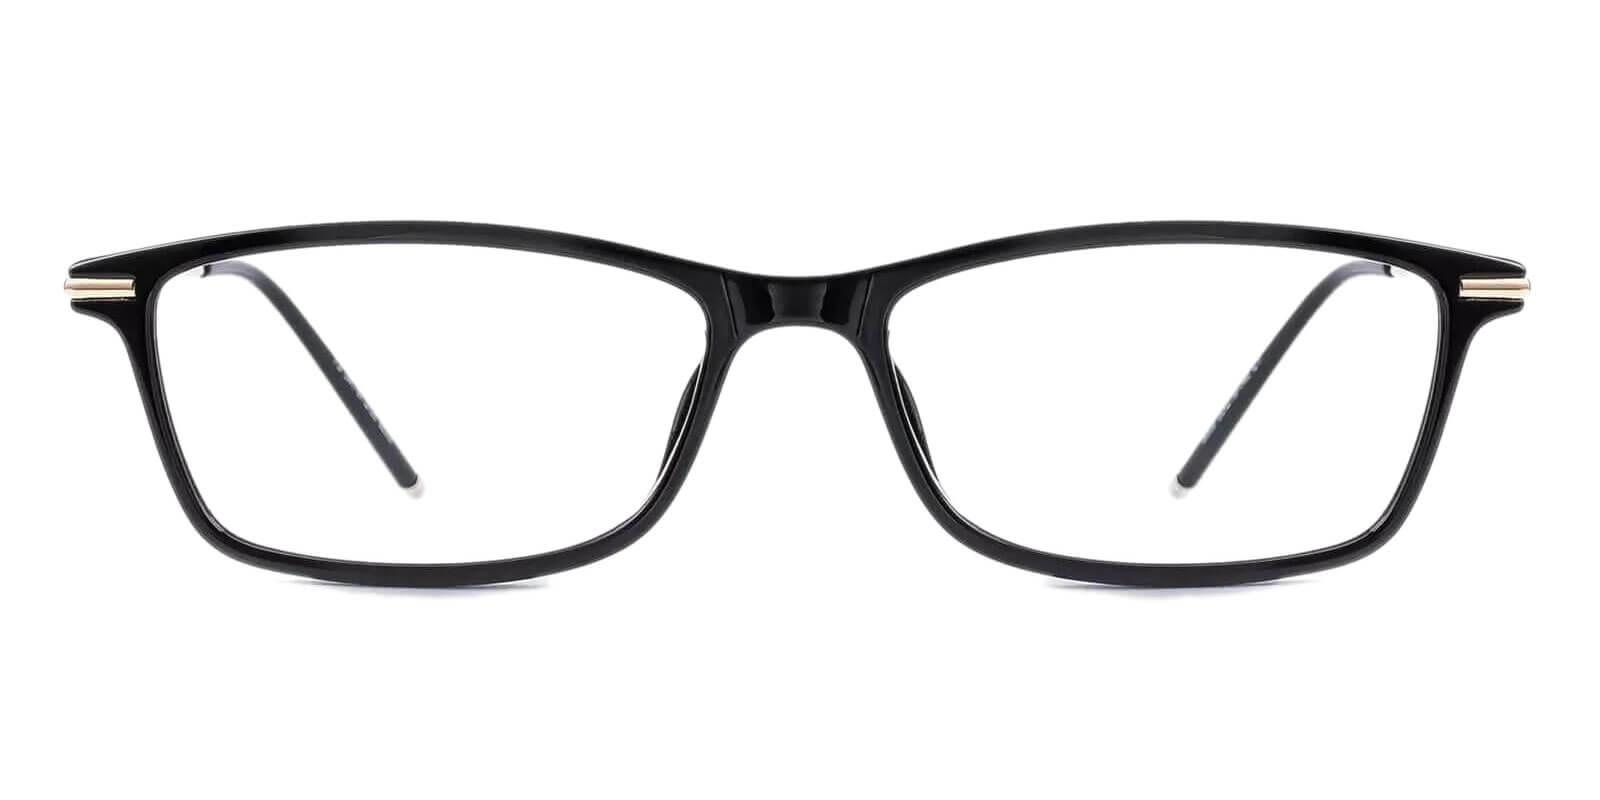 Maldives Black TR Lightweight , UniversalBridgeFit , Eyeglasses Frames from ABBE Glasses